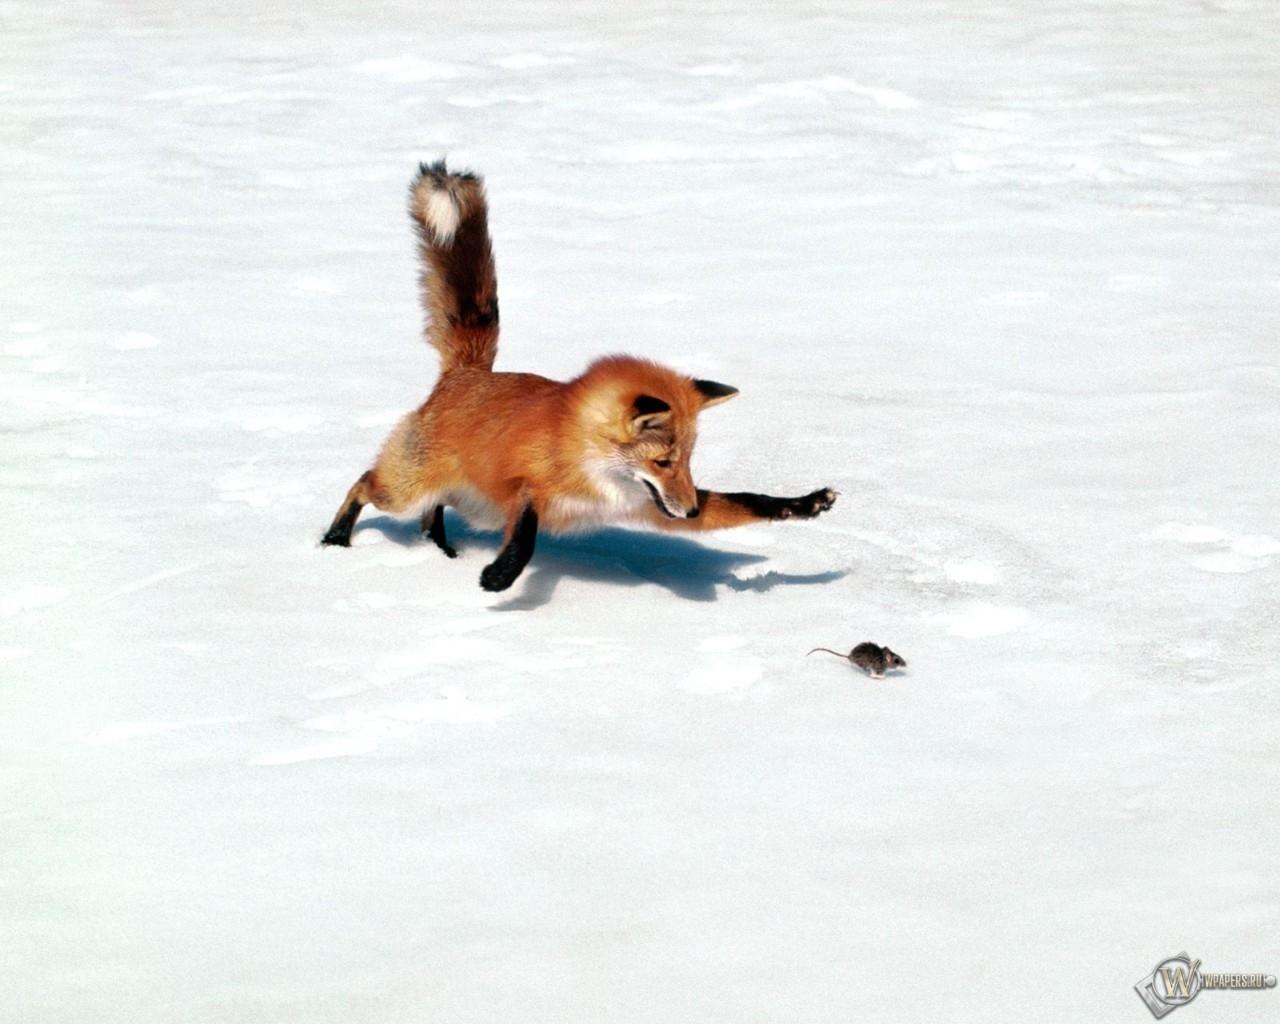 Лиса ловит мышку 1280x1024